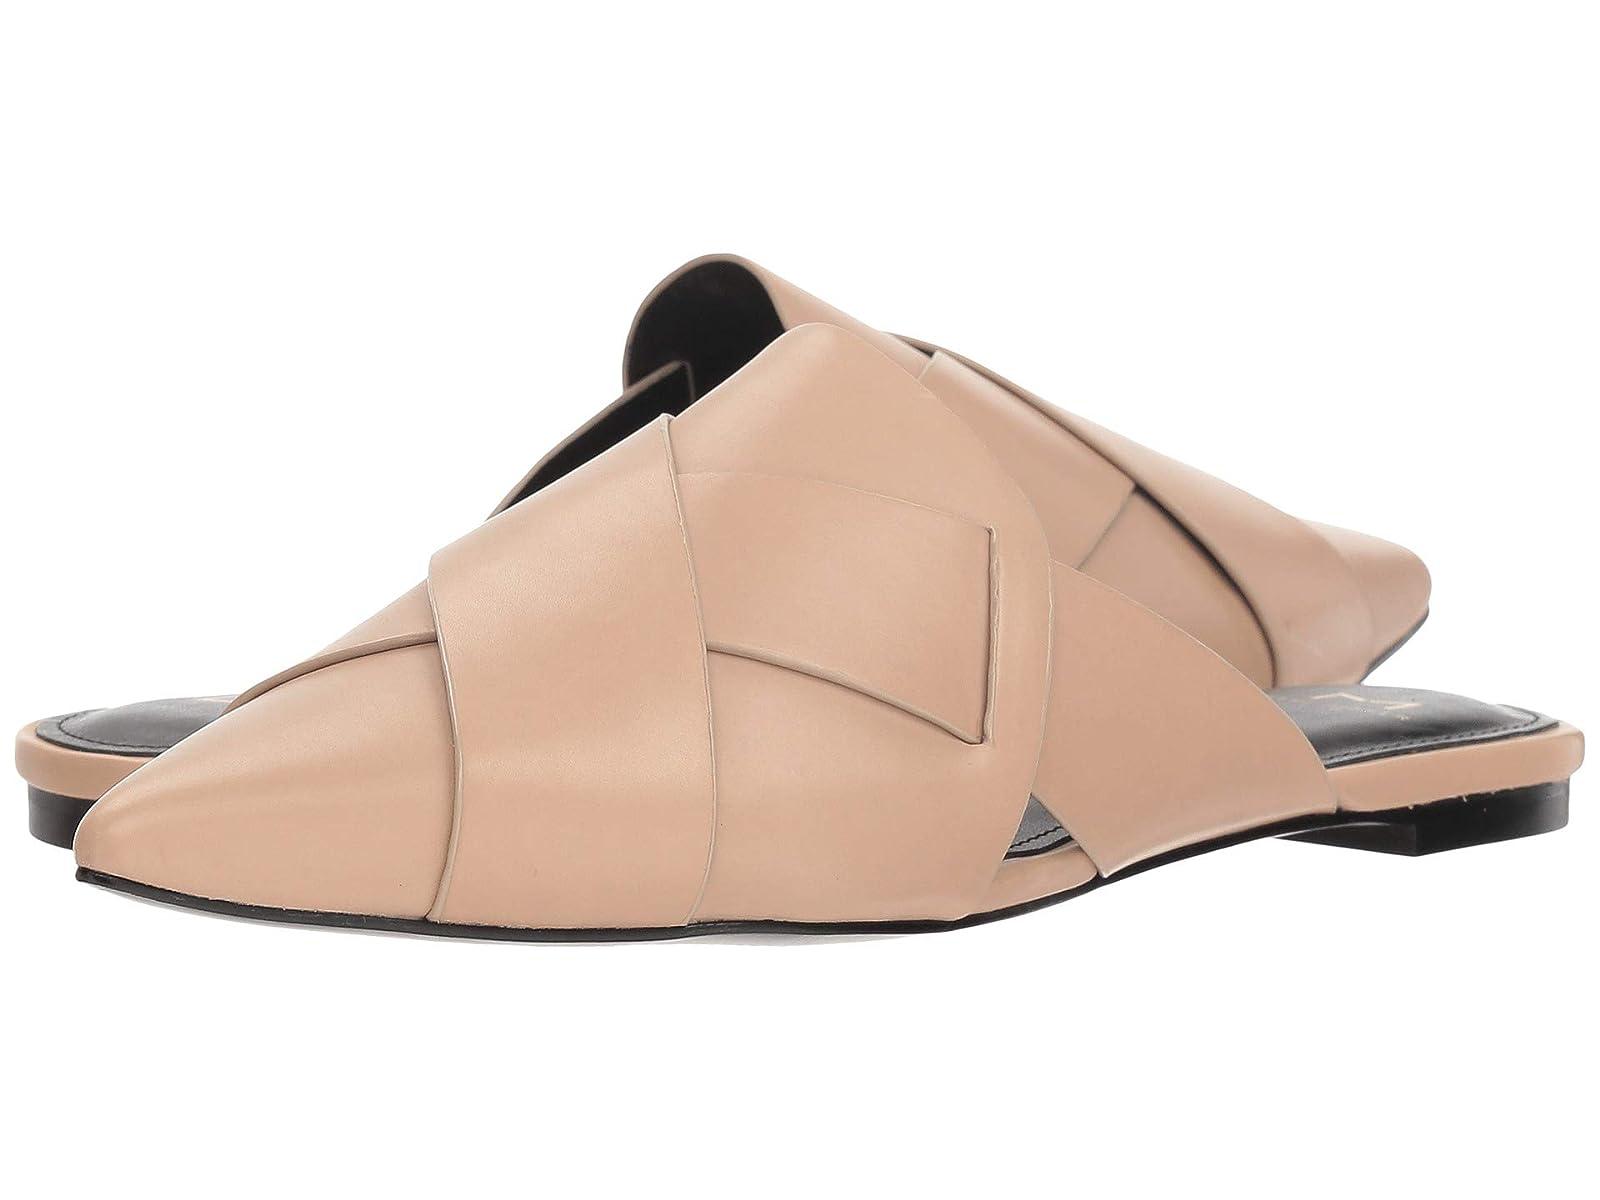 Marc Fisher LTD SonoAtmospheric grades have affordable shoes